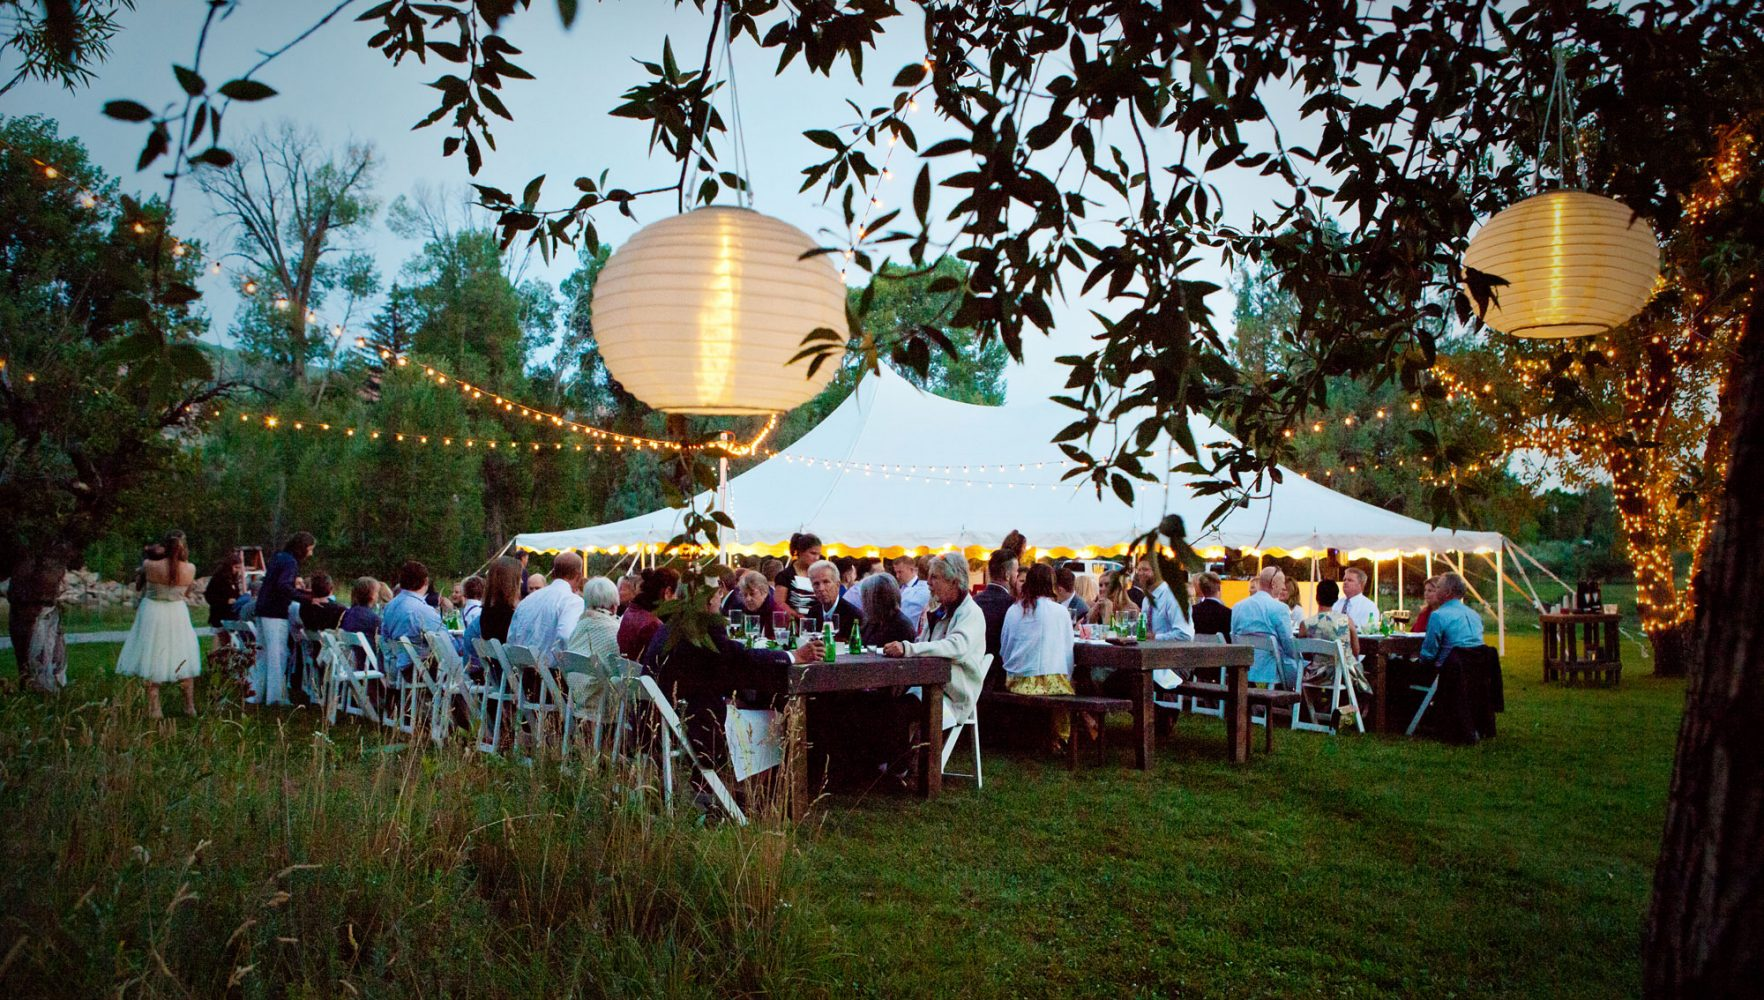 A Backyard wedding in Hermose, Colorado